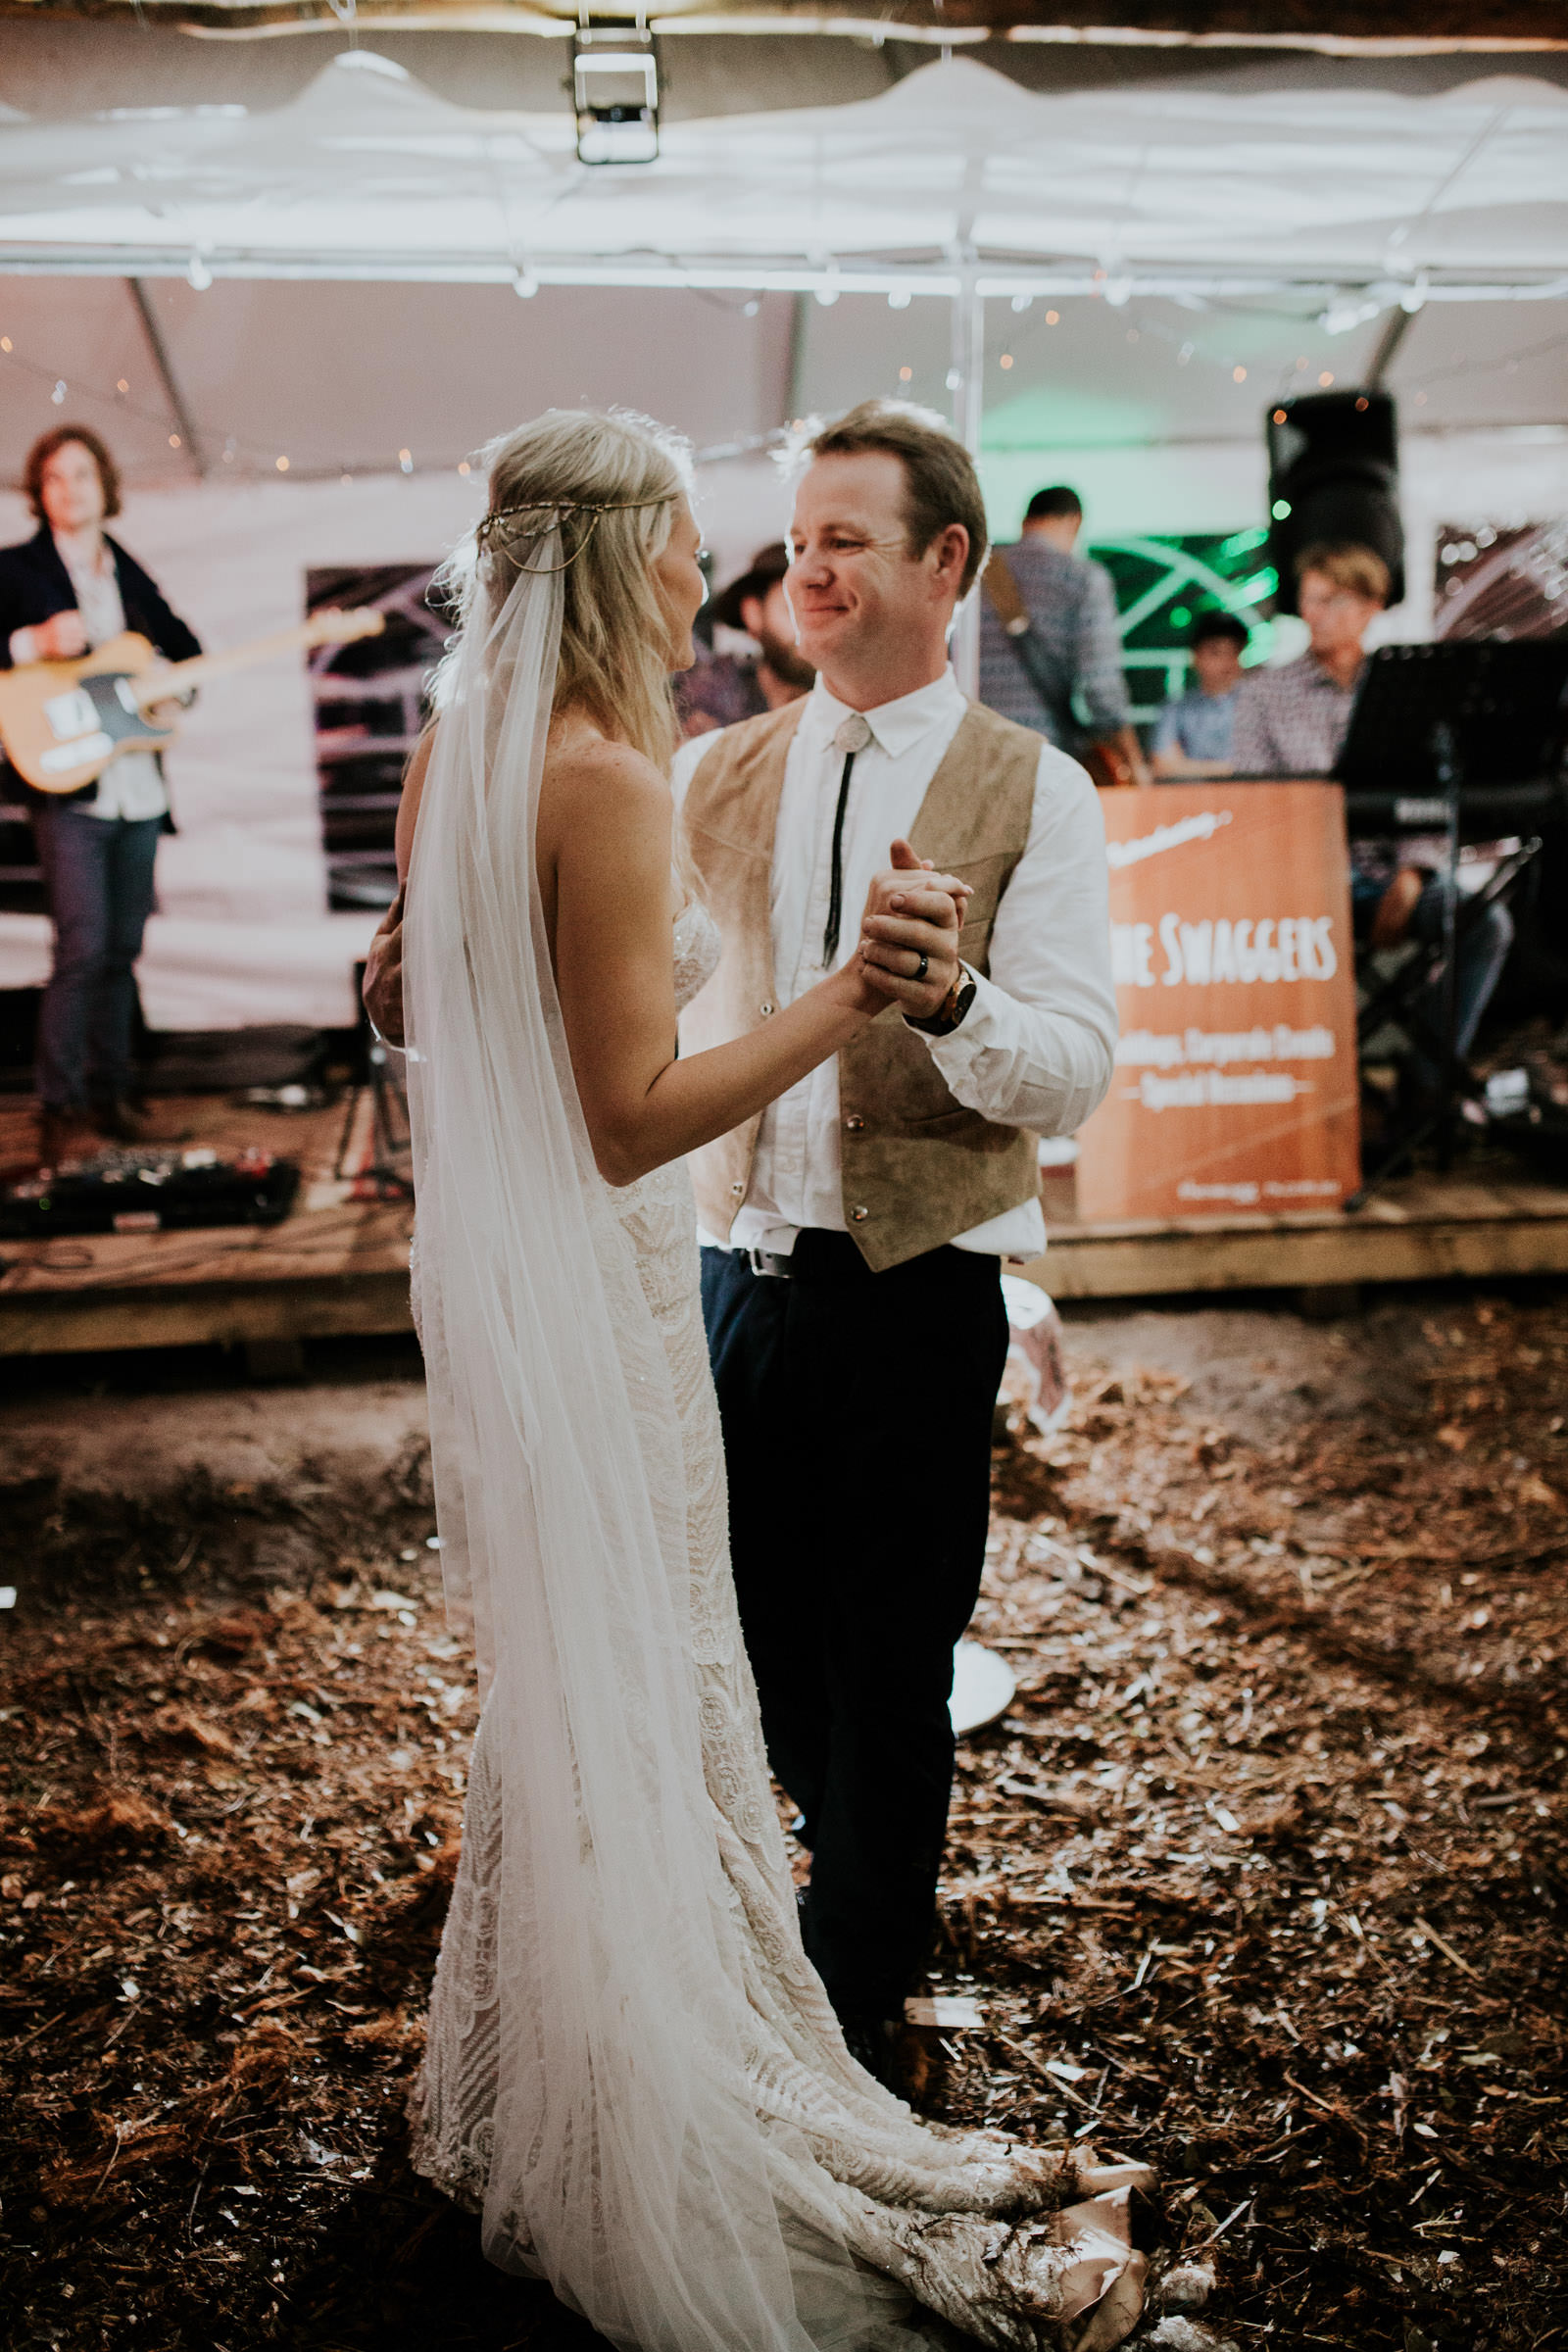 Emma+John+Far+South+Coast+Wedding+Festivl+Glamping+Bush-160.jpg